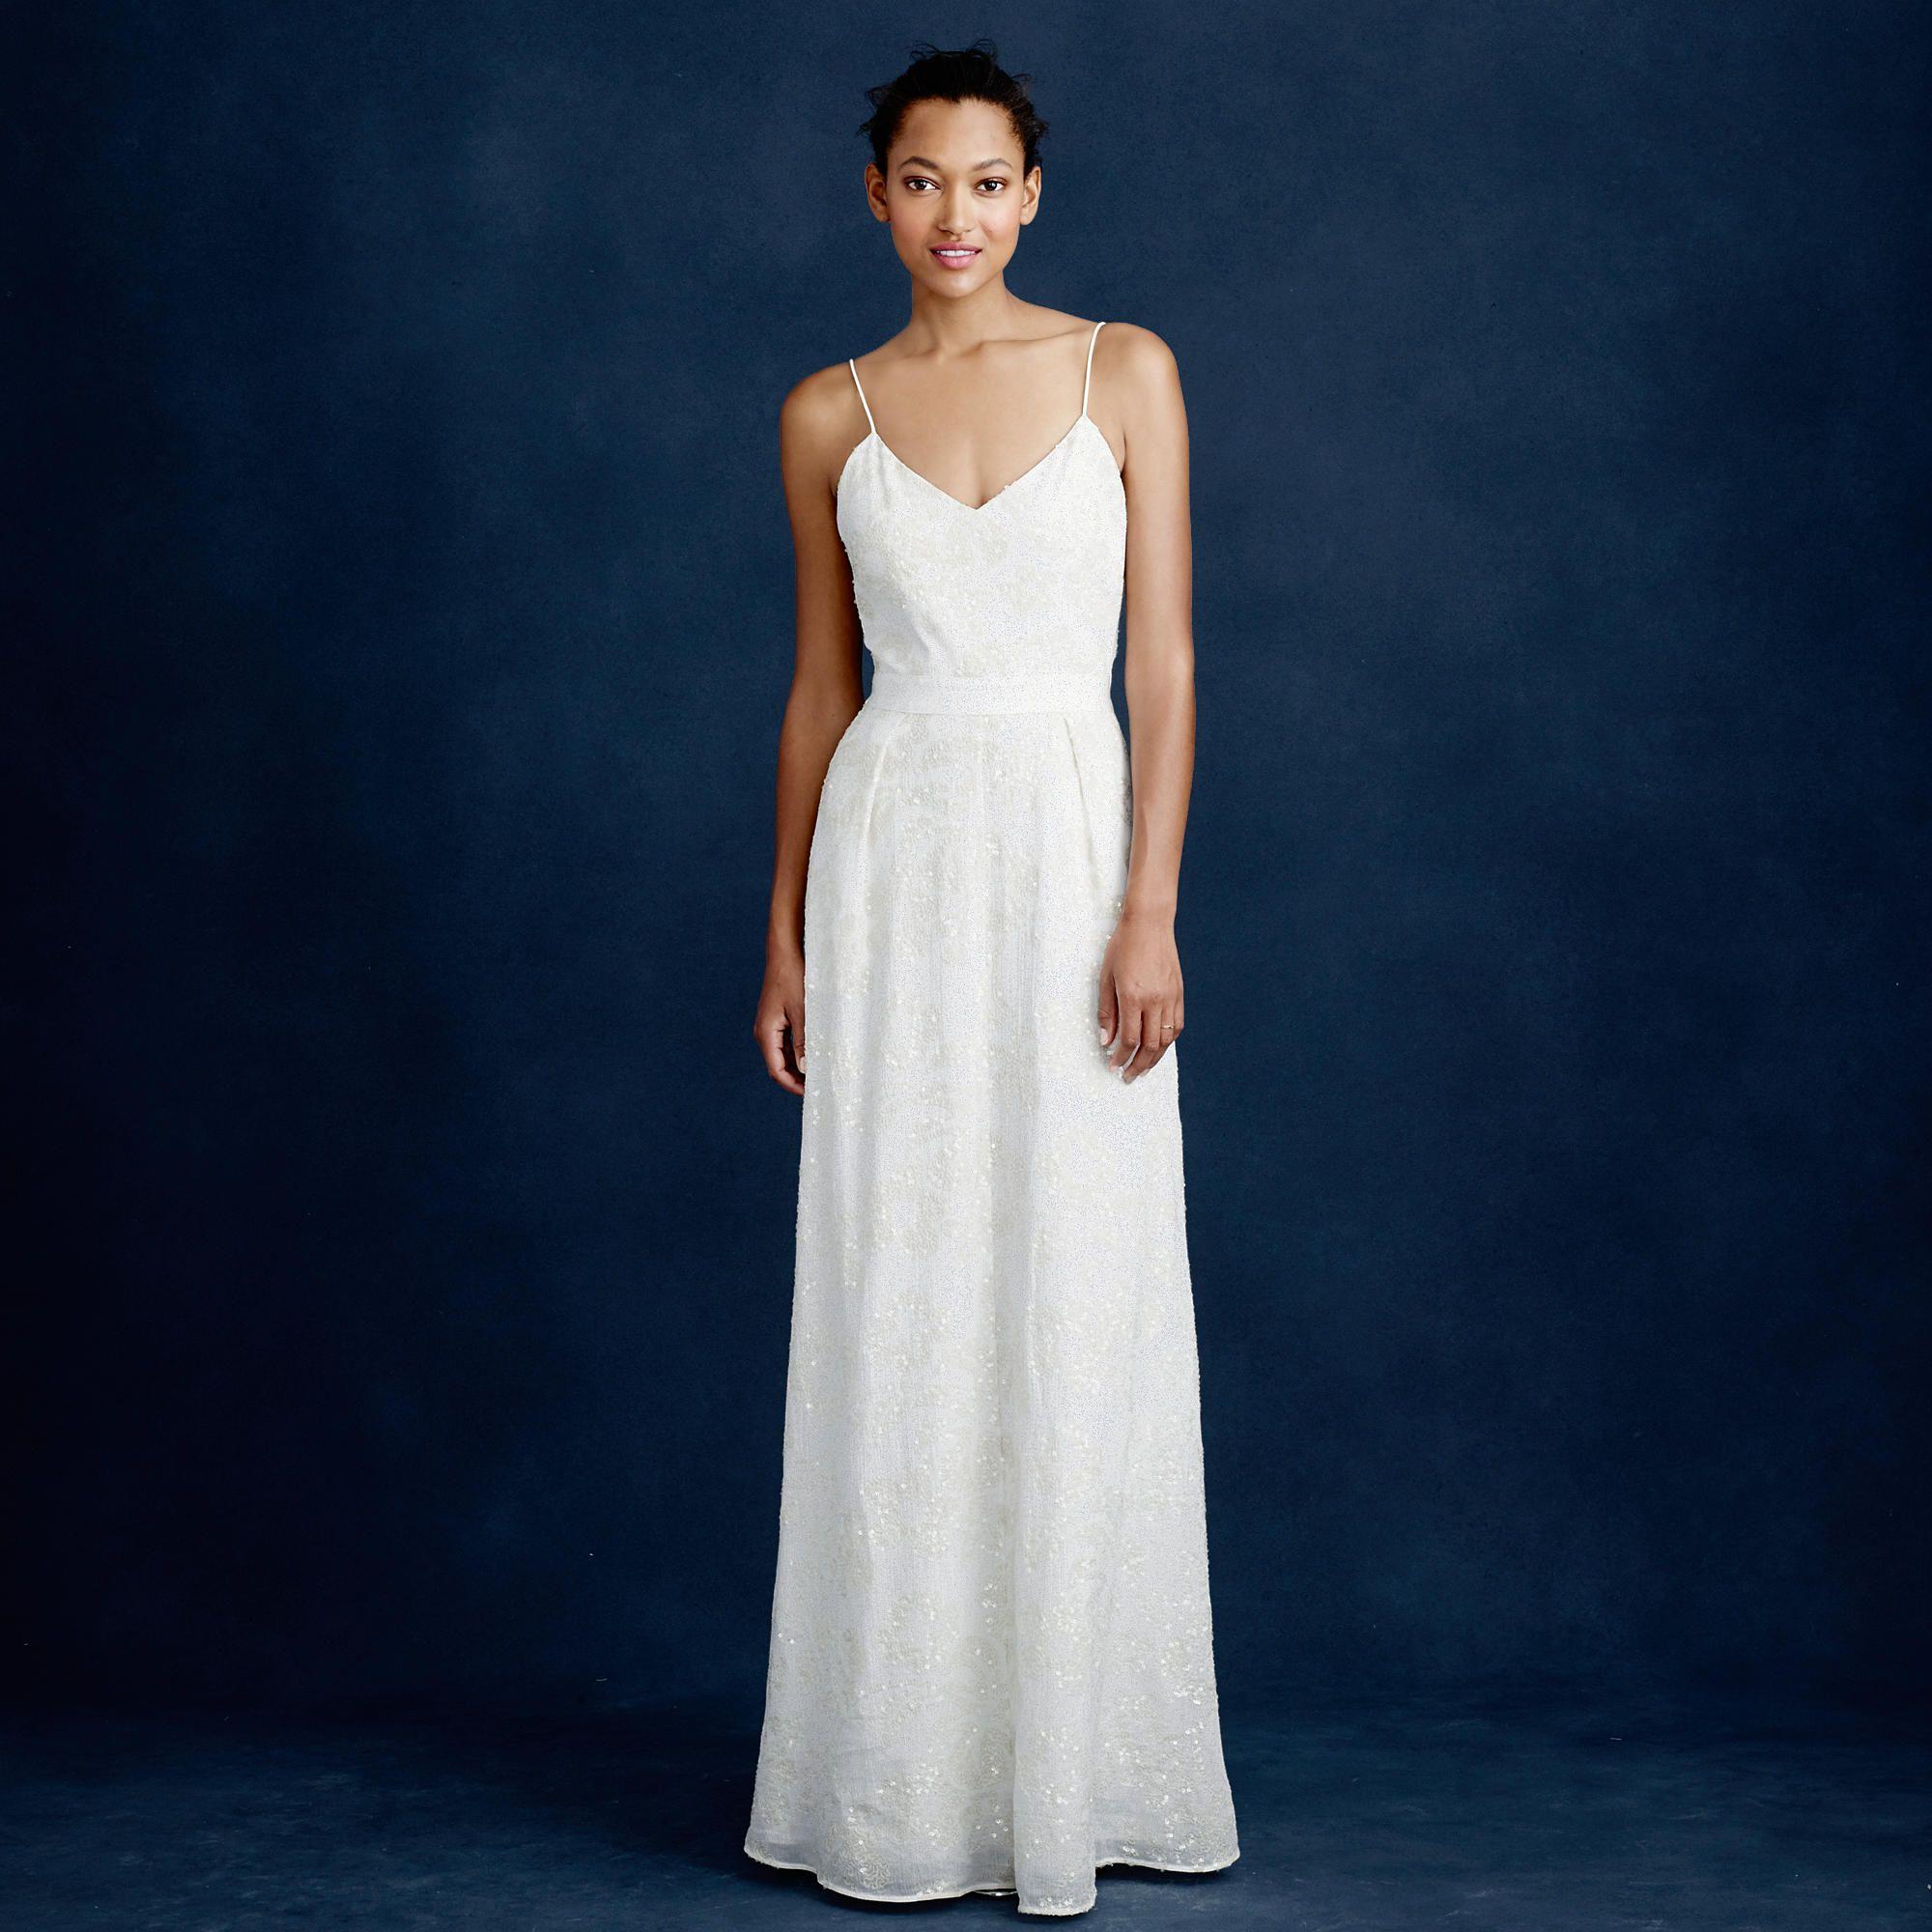 Jcrew wedding dress  JCrew Sequin Plume Gown  Wedding  Pinterest  Sequins Gowns and